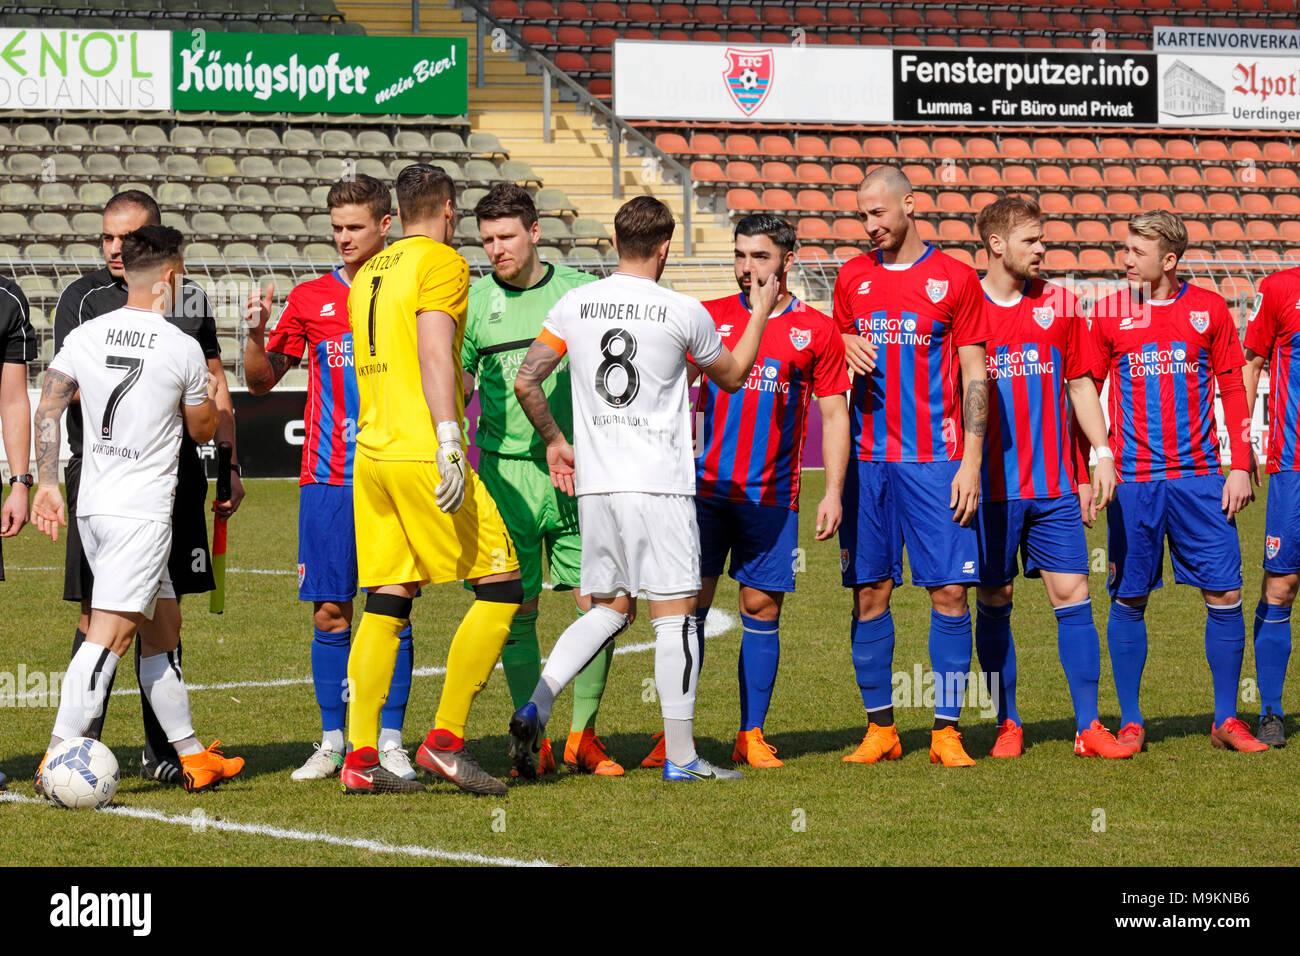 sports, football, Regional League West, 2017/2018, Grotenburg Stadium in Krefeld-Bockum, KFC Uerdingen 05 vs FC Viktoria Koeln 1904 1:1, welcome, f.l.t.r. Simon Handle (Koeln), Mario Erb (KFC), keeper Sebastian Patzler (Koeln), keeper Rene Vollath (KFC), Mike Wunderlich (Koeln), Oguzhan Kefkir (KFC), Tanju Oeztuerk (KFC), Maximilian Beister (KFC), Connor Krempicki (KFC) - Stock Image